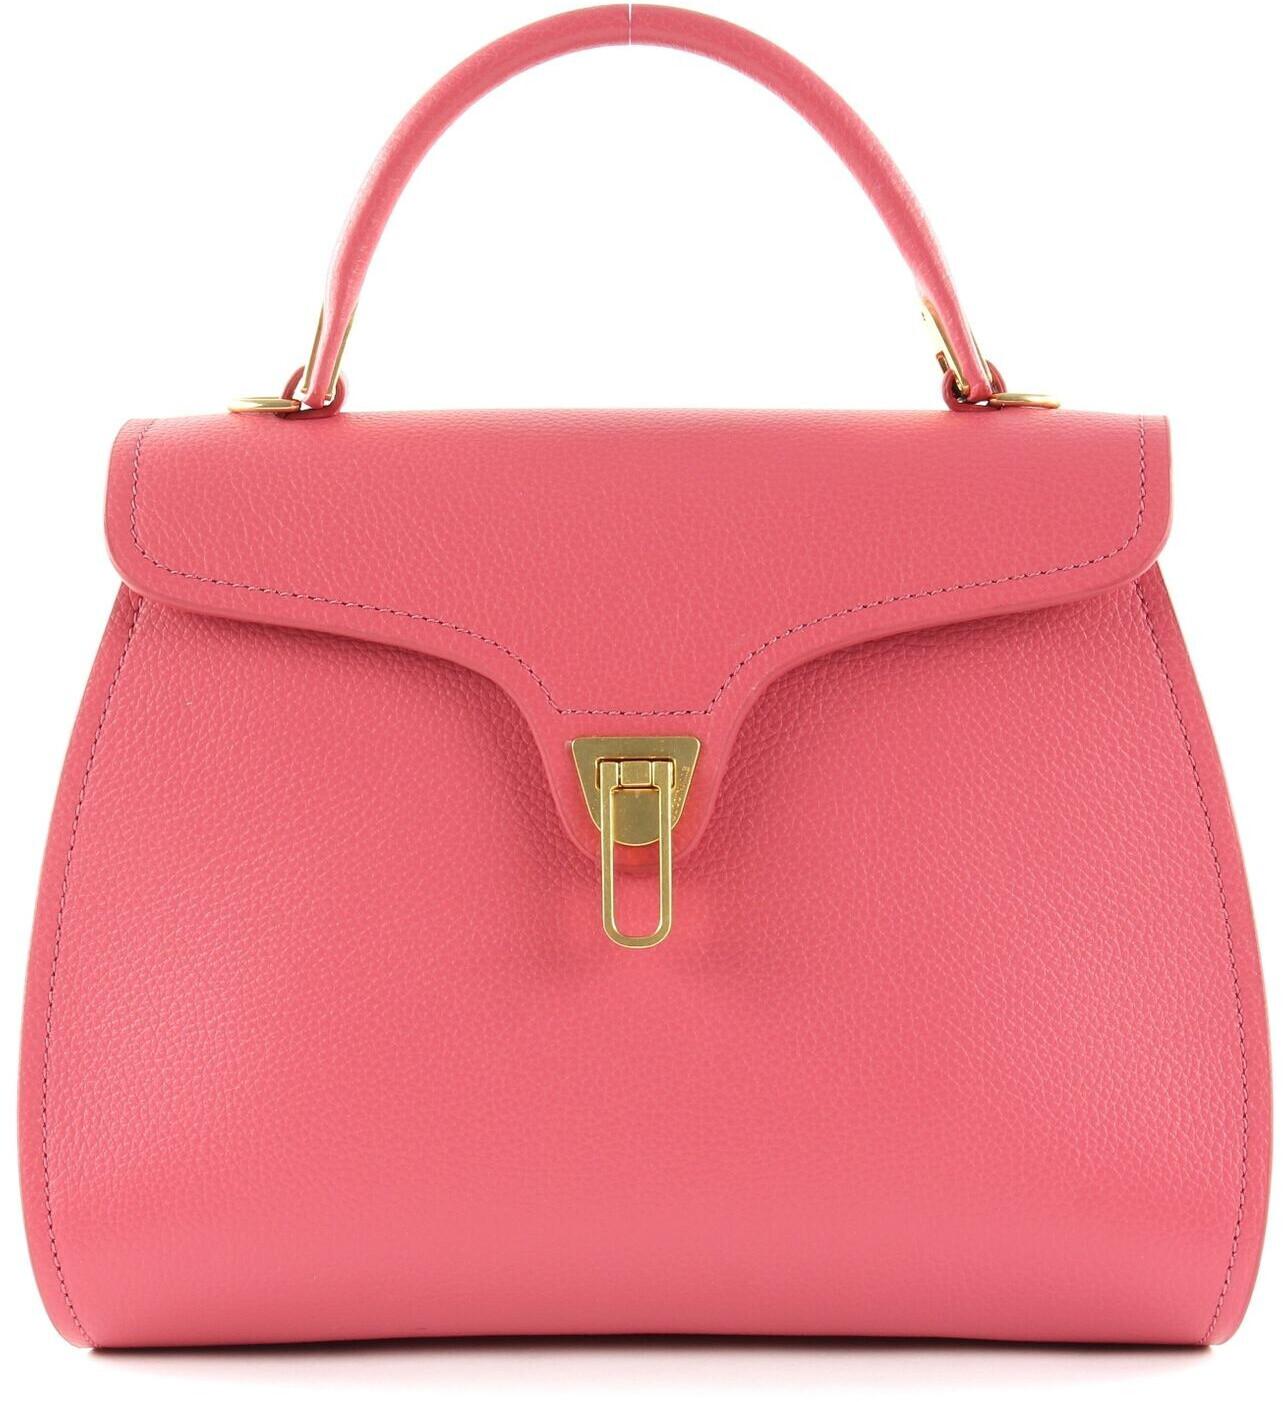 Coccinelle Marvin Small Handbag